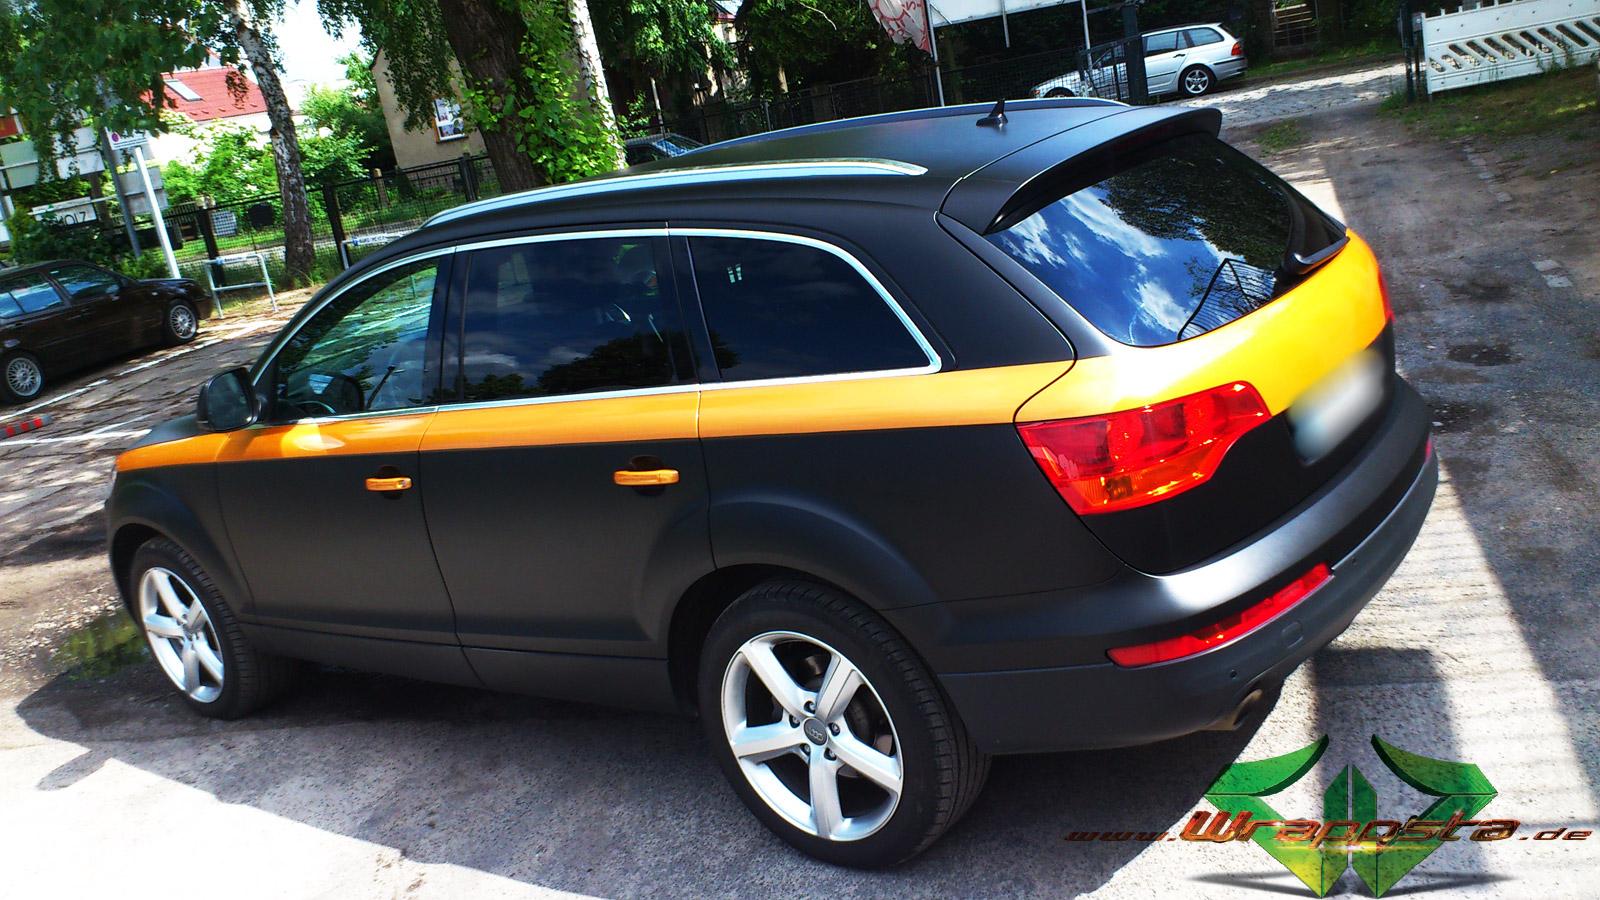 Audi Q7 Matt Schwarz Amp Gold Orange Pearlescent